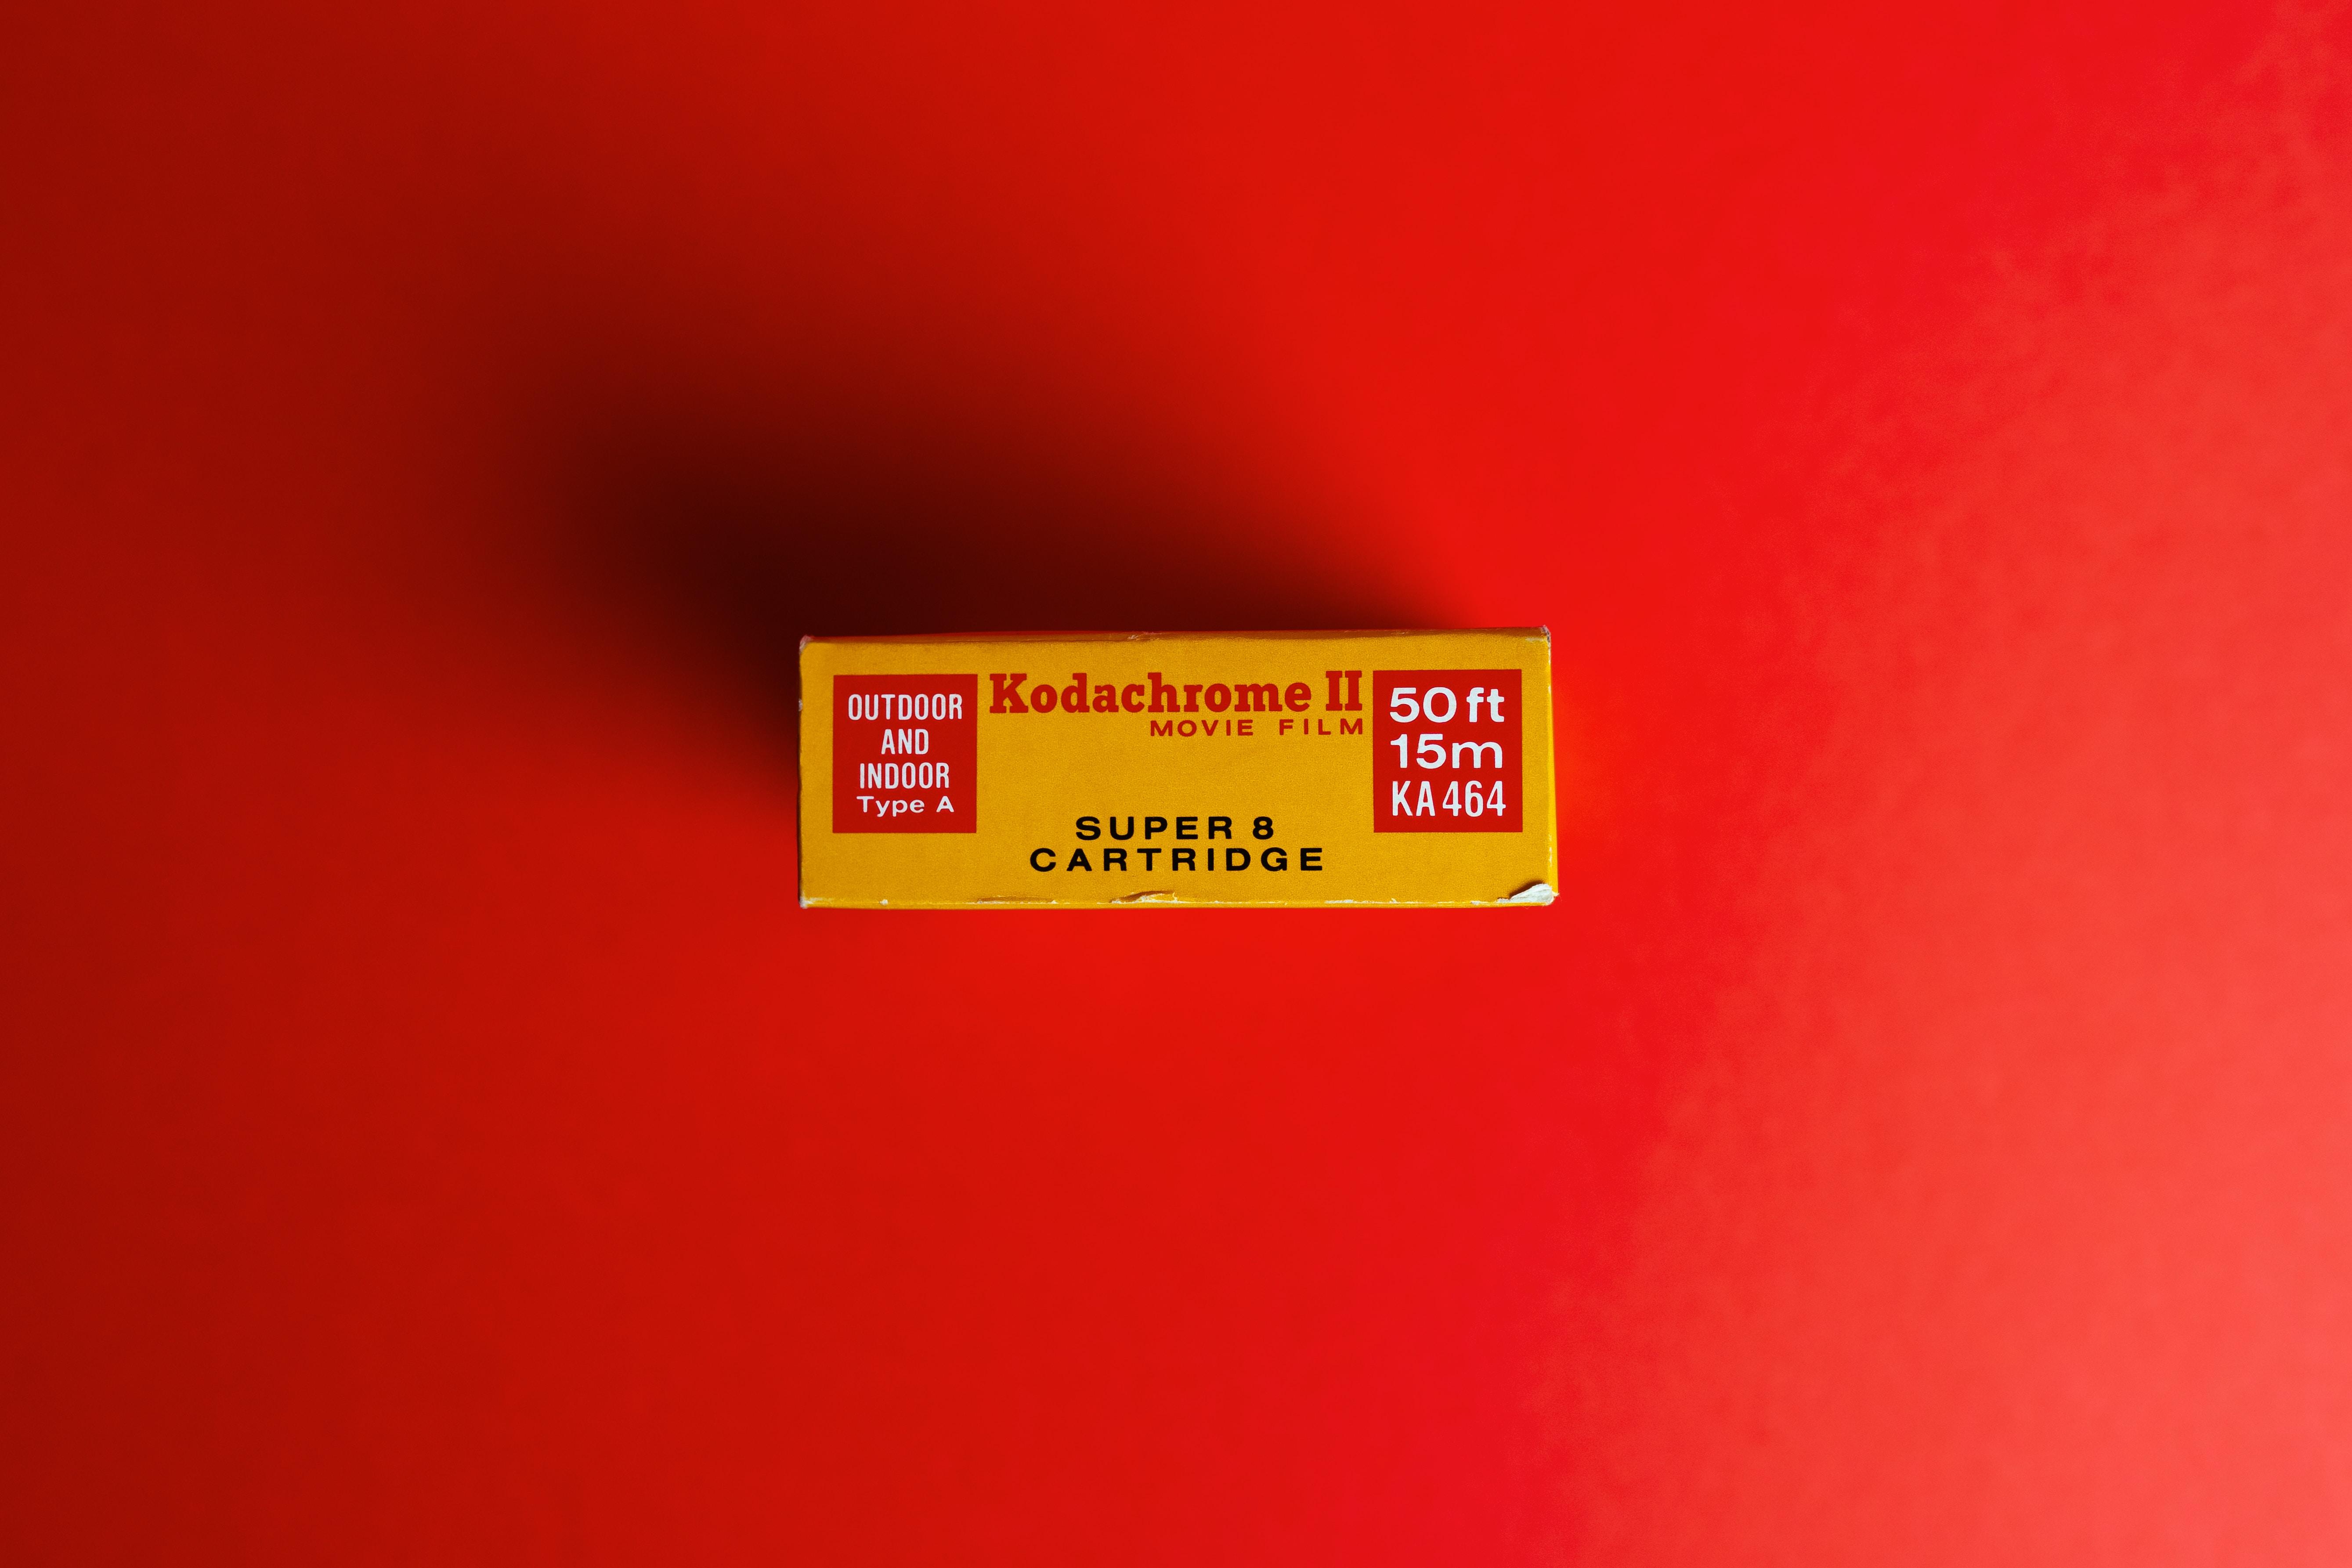 Super 8 Kodak Kodachrome II expired Dec. '73